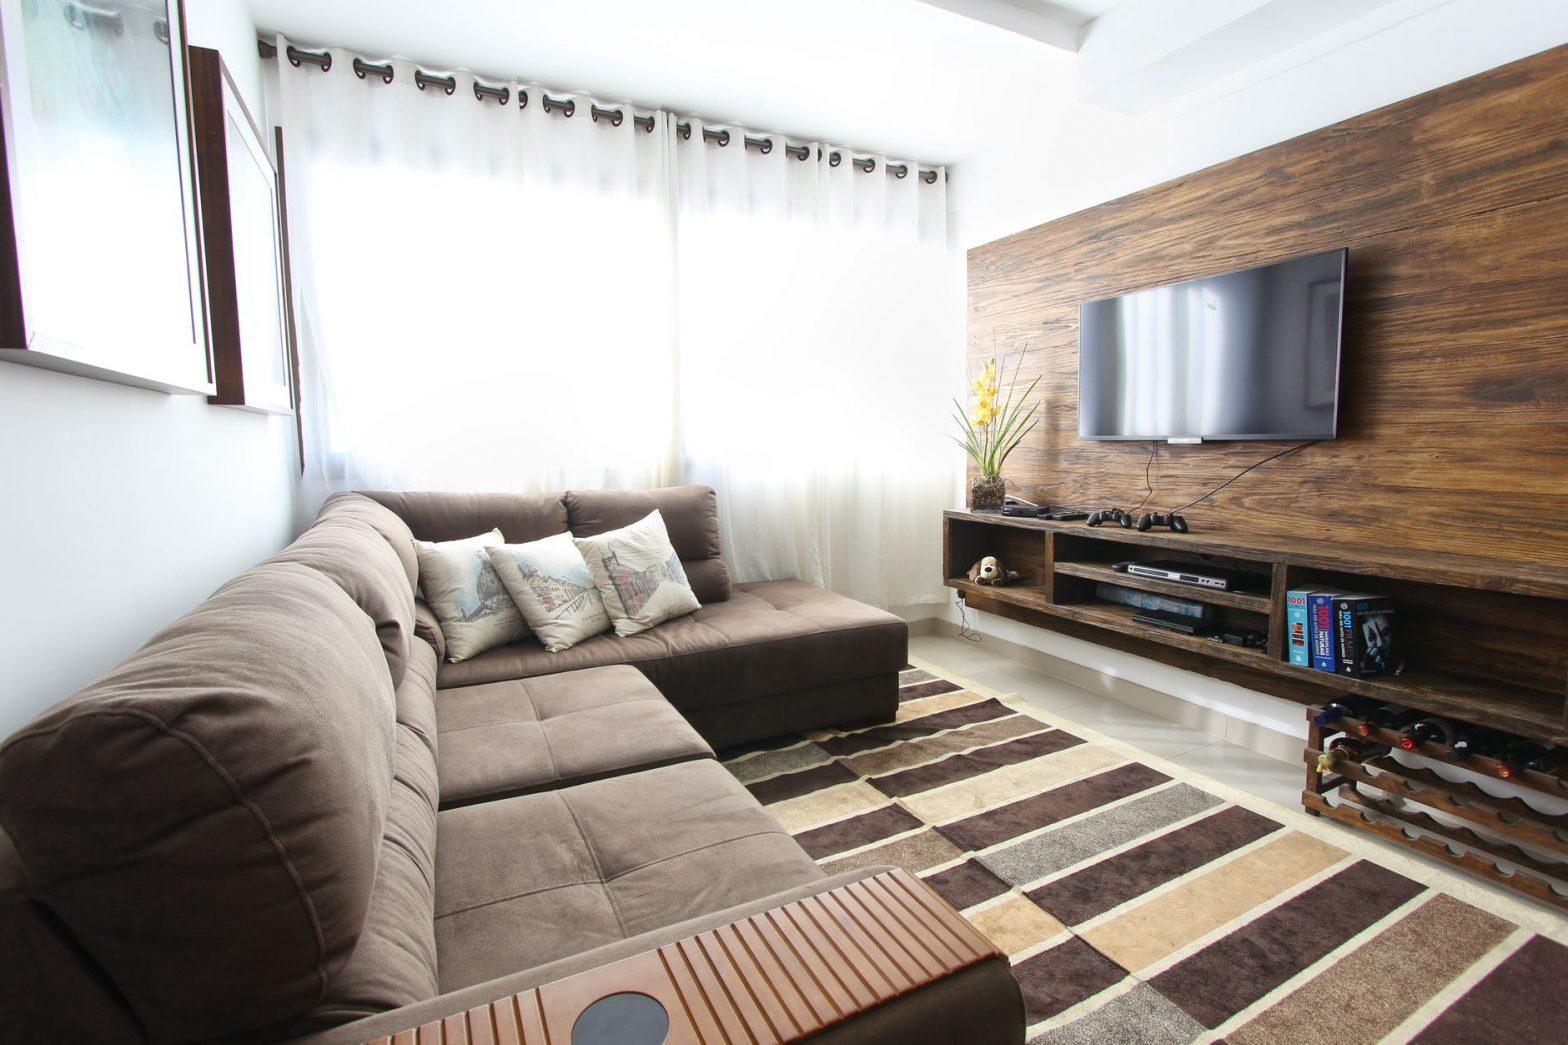 apartament aranżacje